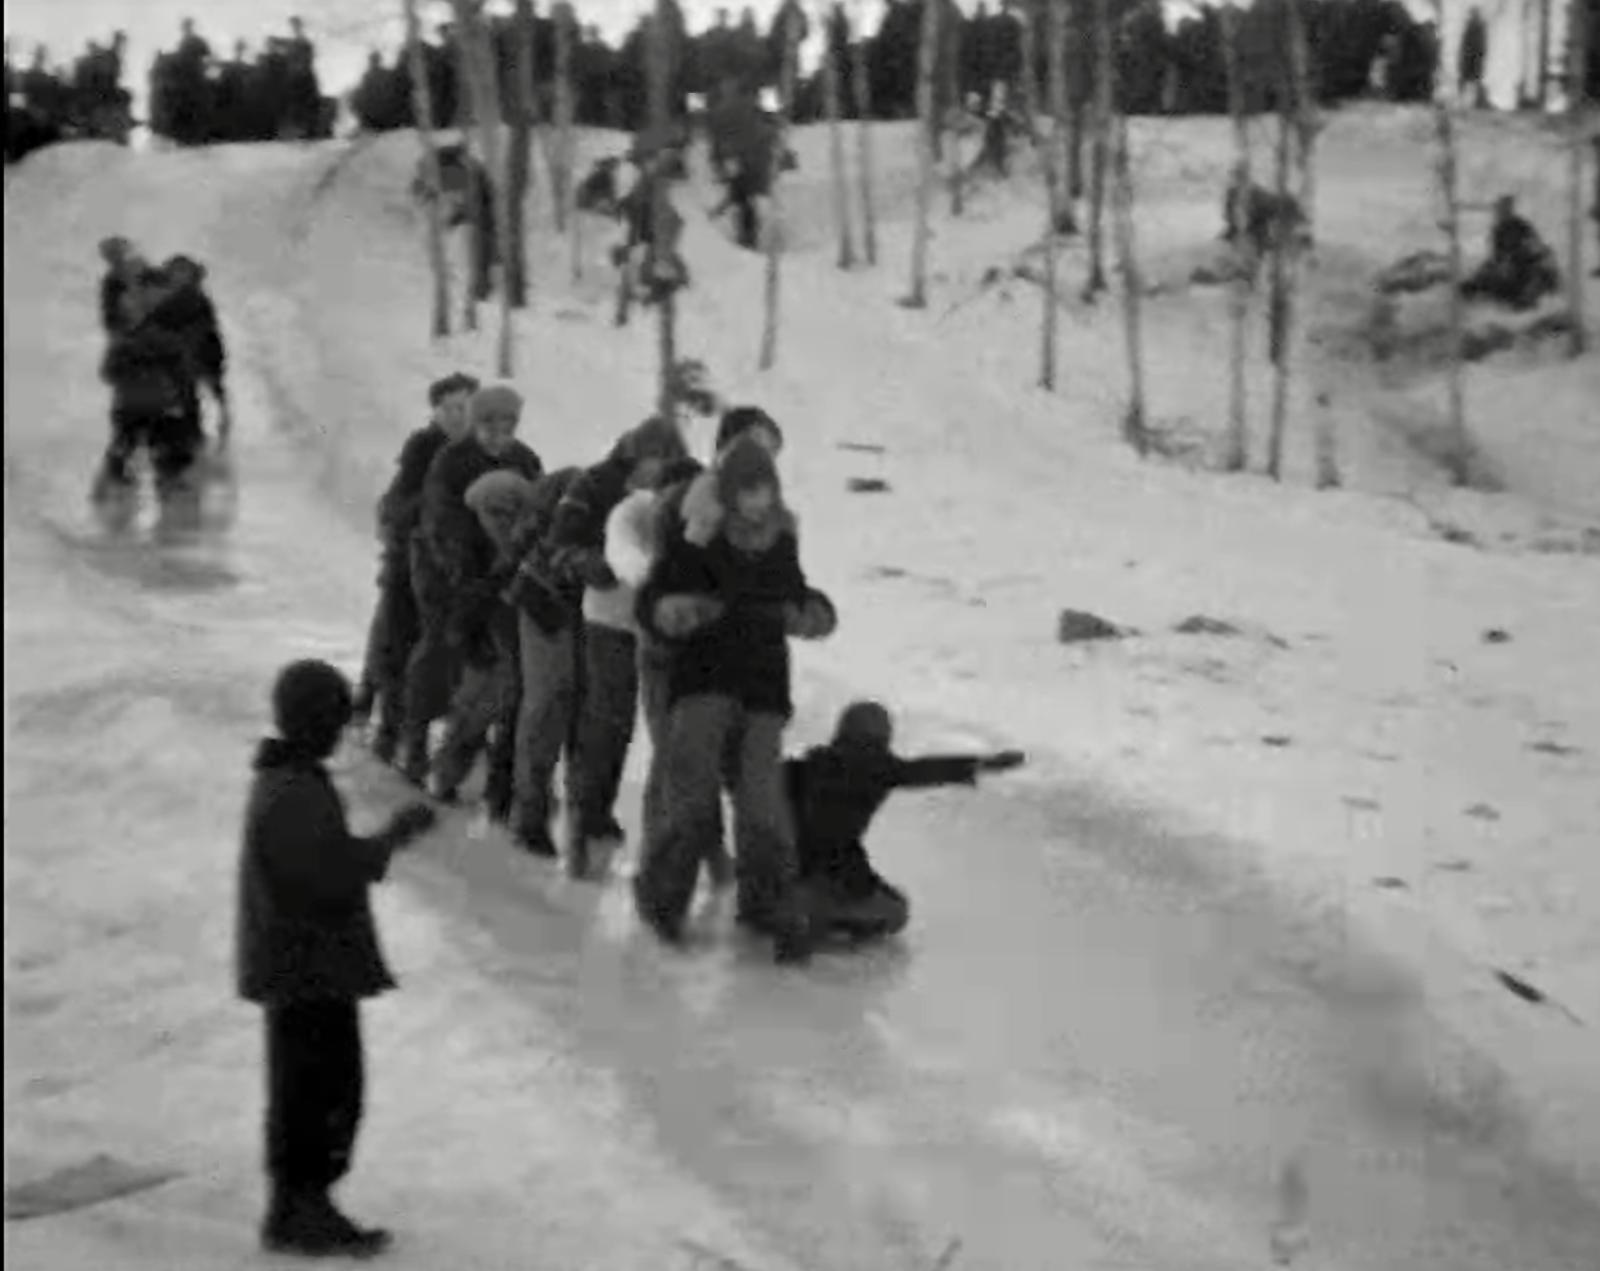 1939 16mm home movie sledding